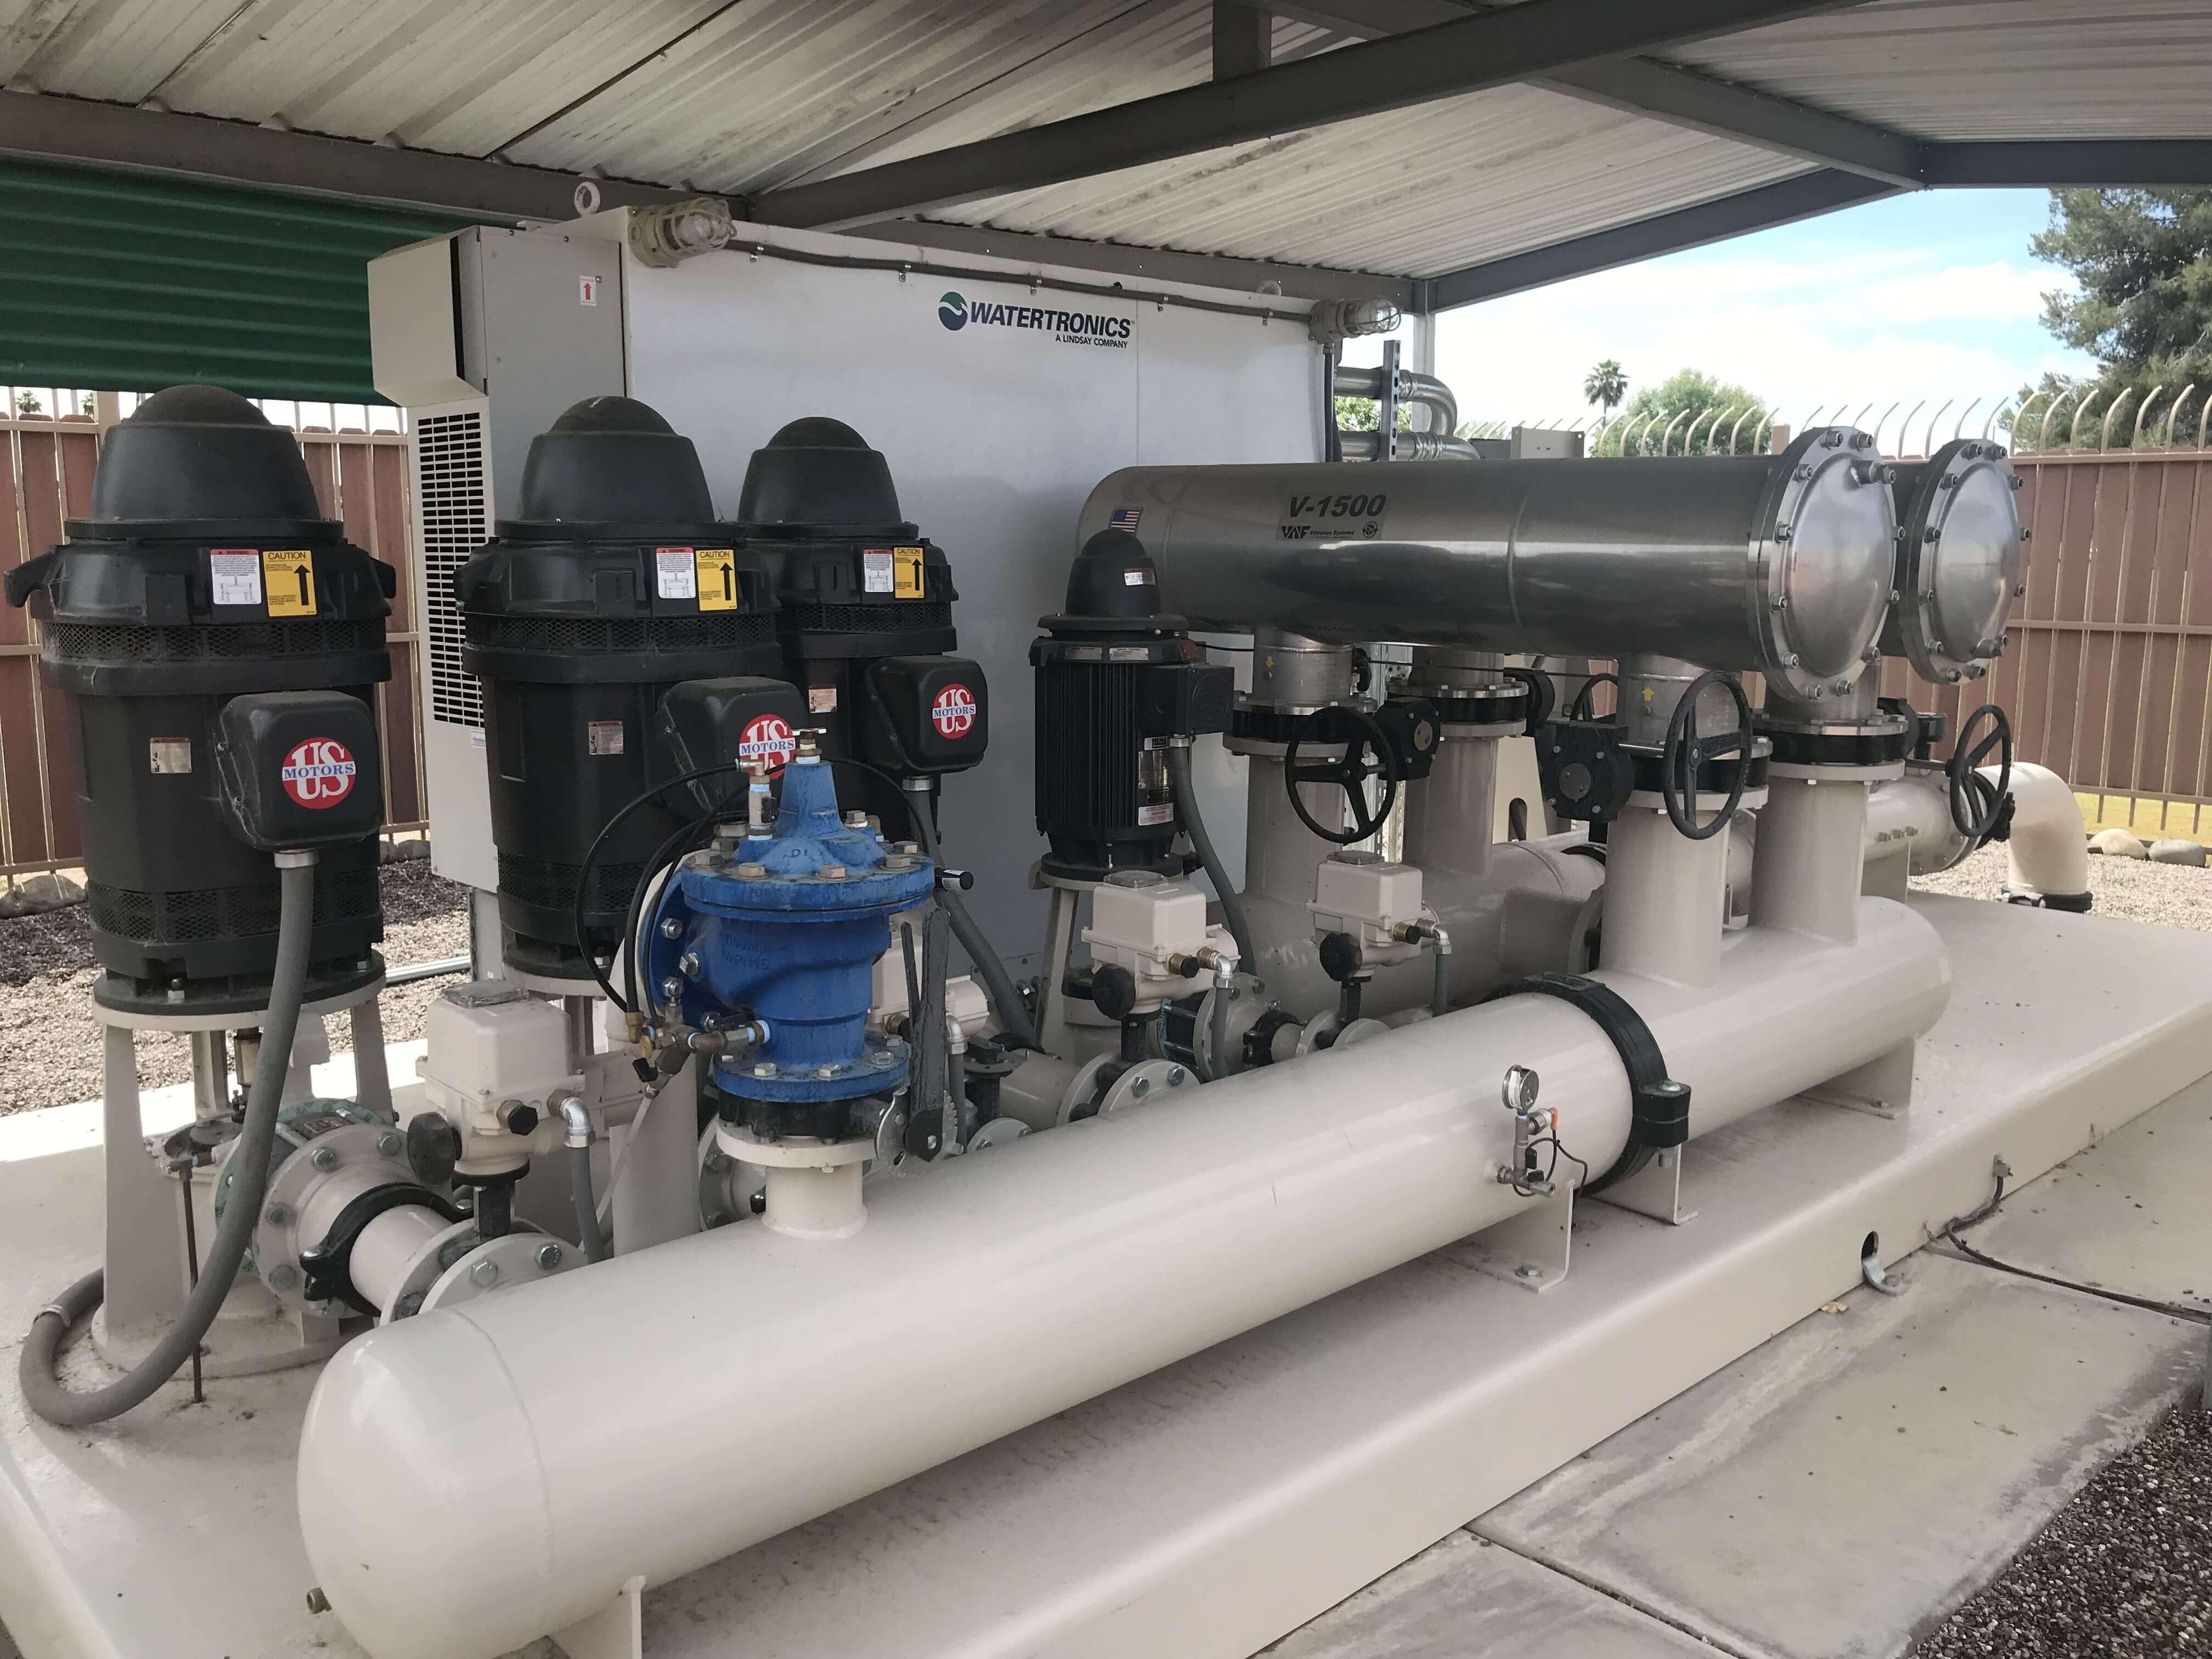 Pumping equipment with proper maintenance